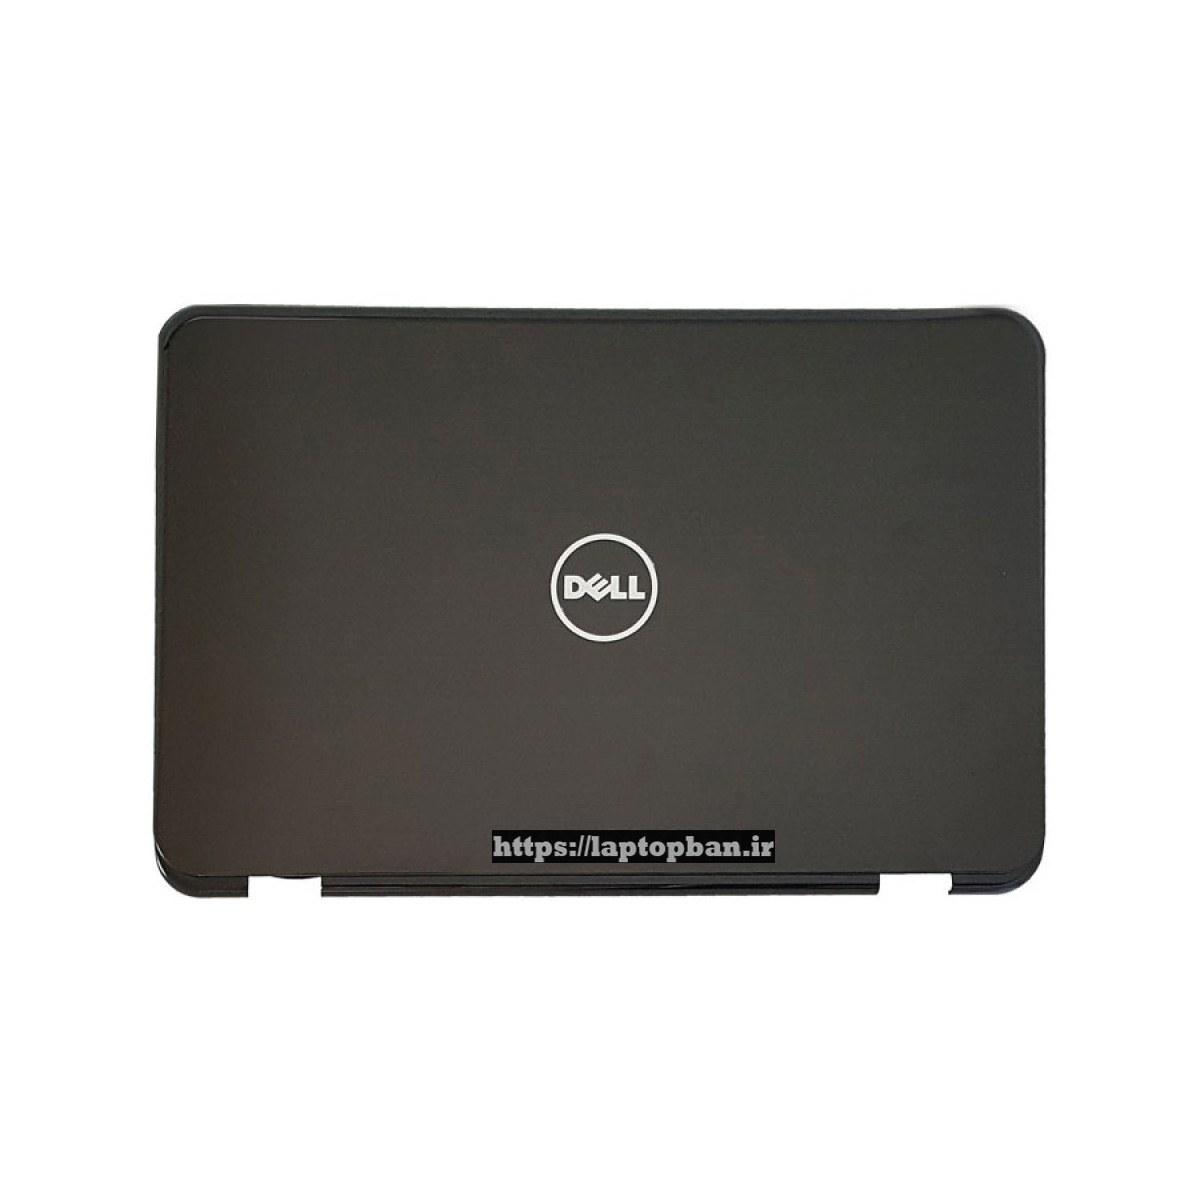 قاب پشت ال سی دی لپ تاپ دل Dell Inspiron 5110 مشکی